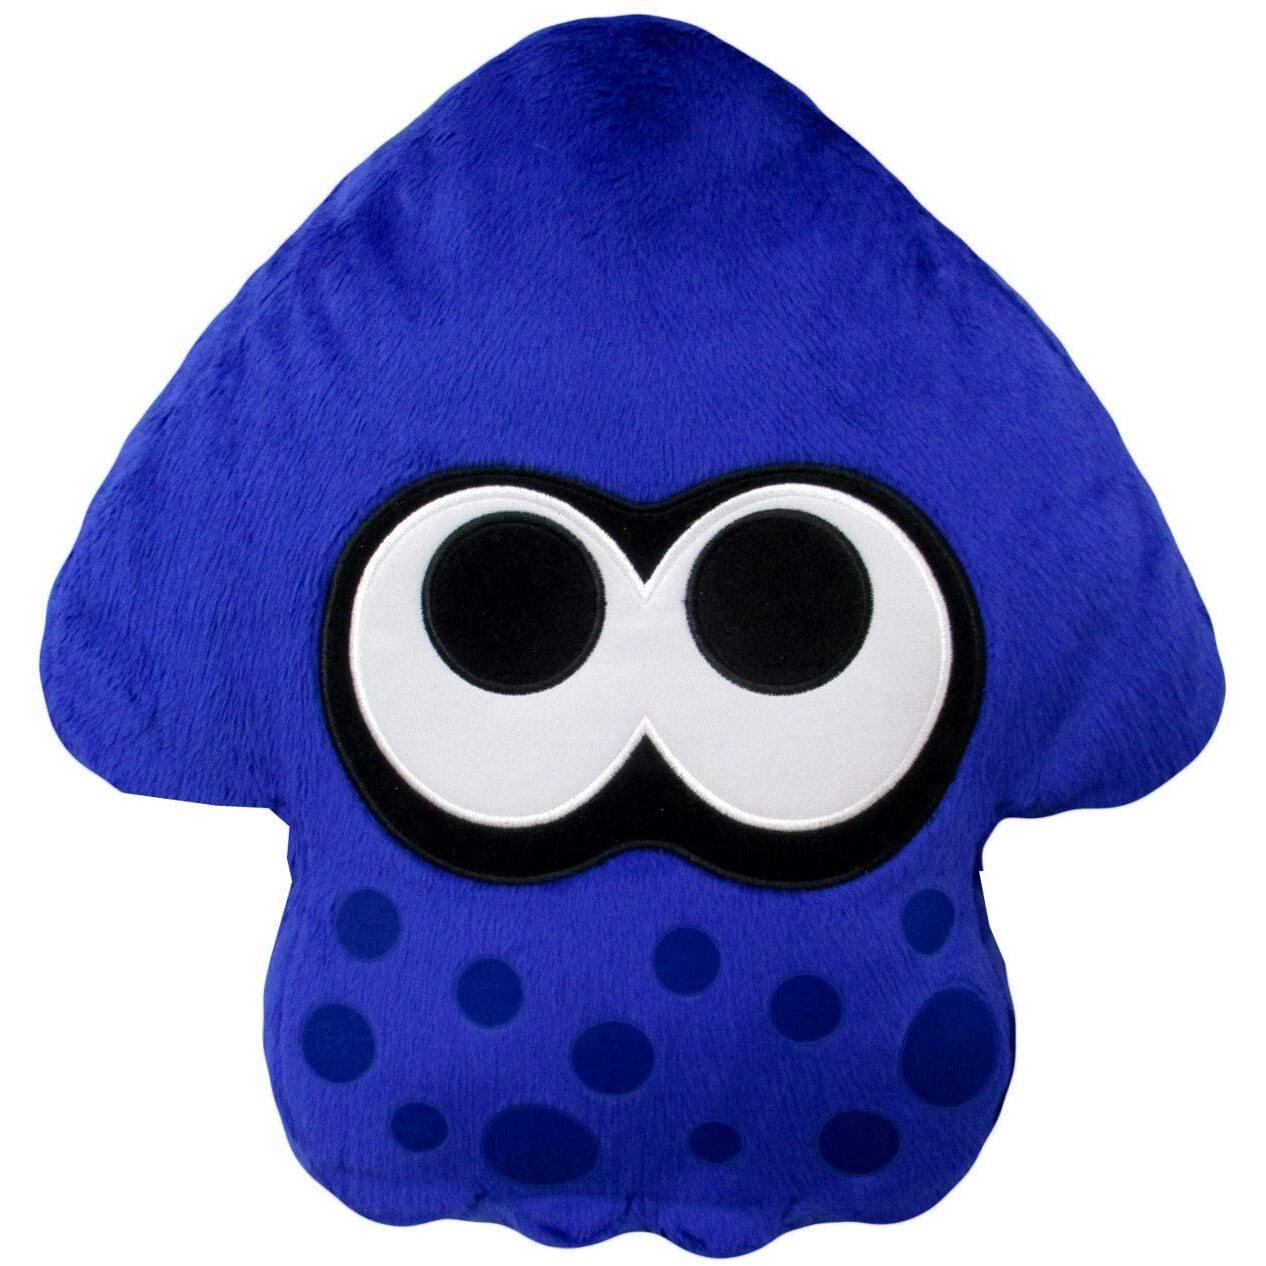 Bright Blue Splatoon 2 Squid Cushion (1)